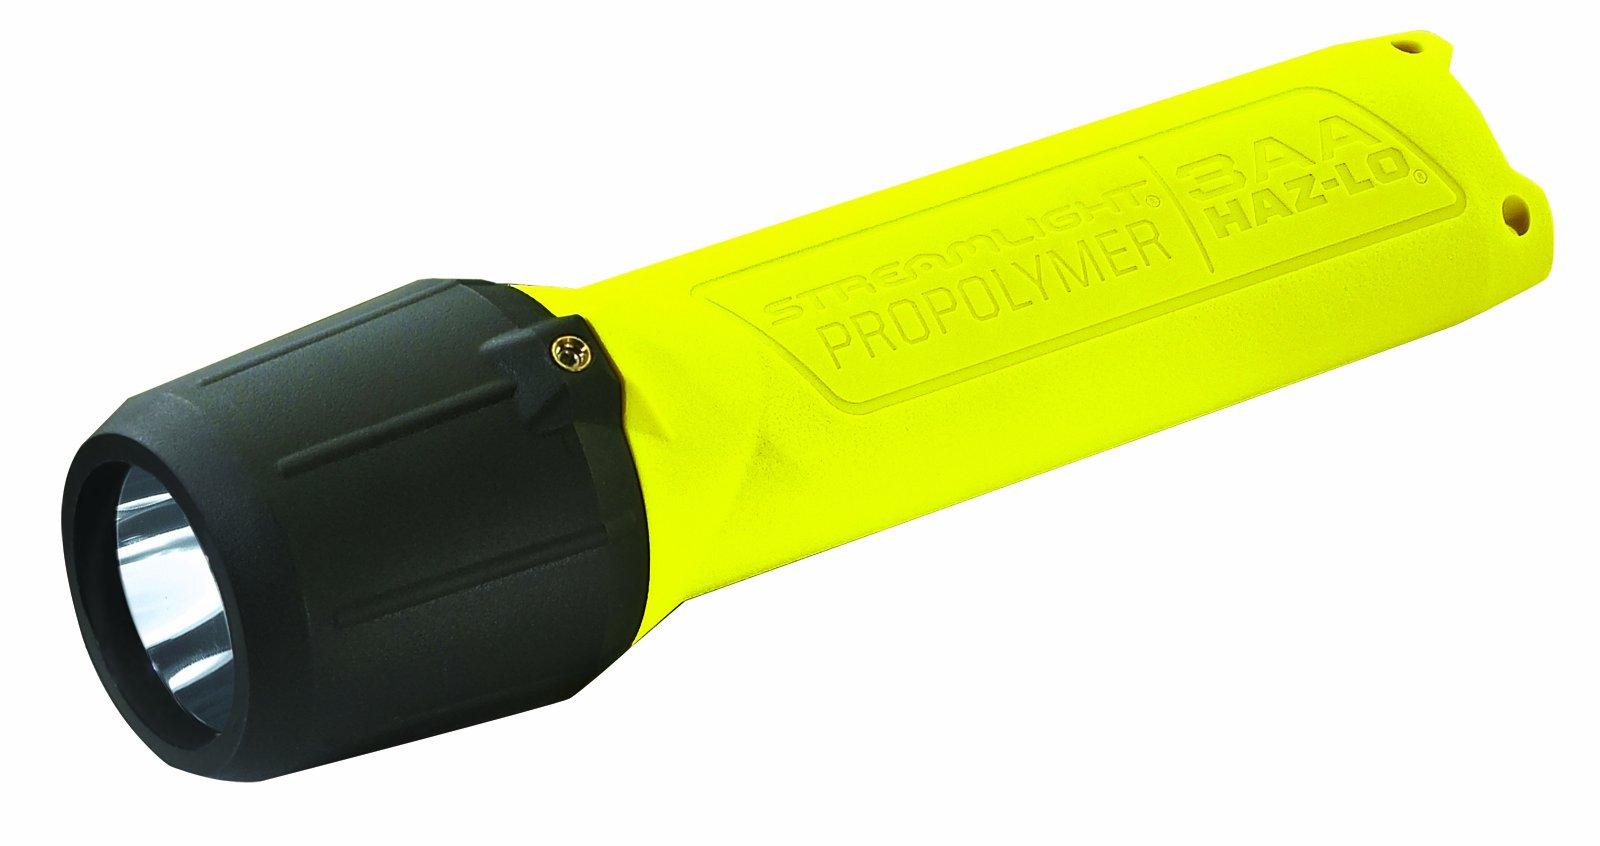 Streamlight 68720 3AA ProPolymer HAZ-LO Safety Rated Flashlight, Yellow - 120 Lumens